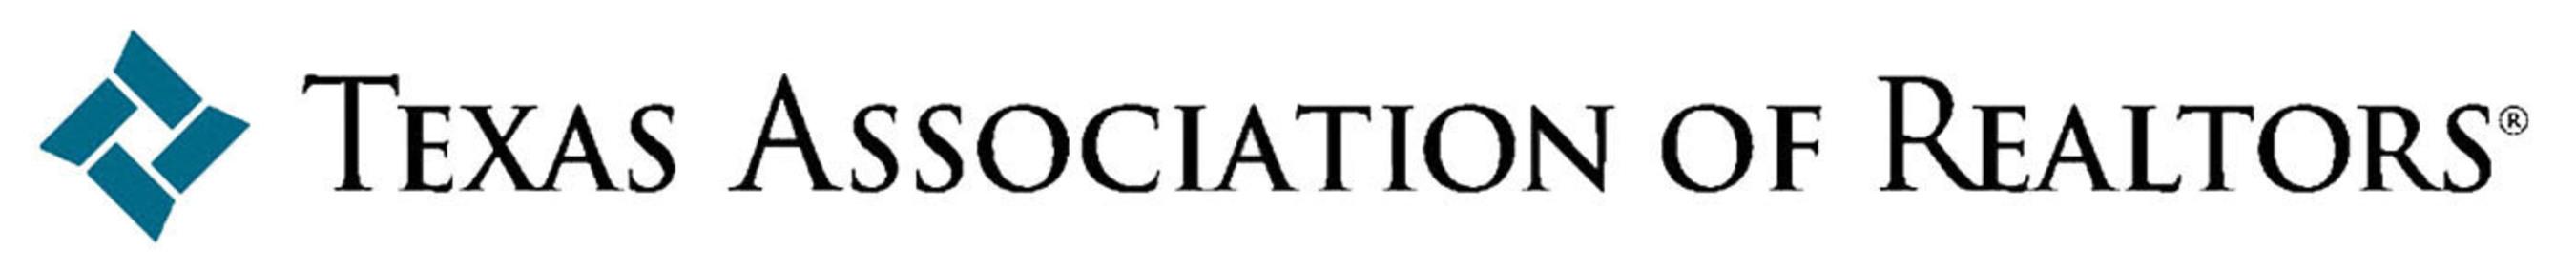 Texas Association of Realtors logo